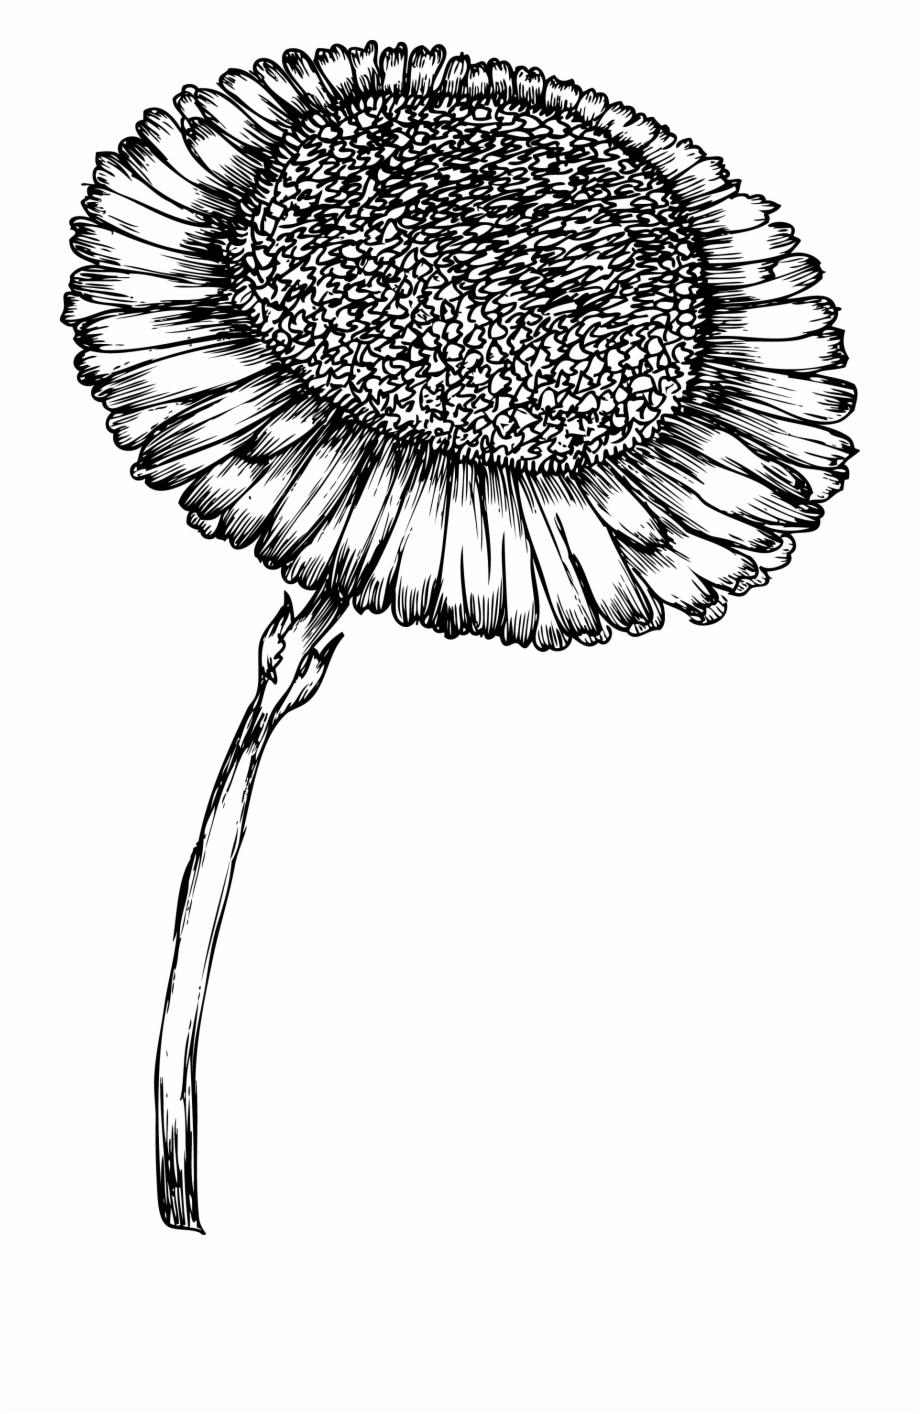 Wood print clipart jpg free stock Sunflower Bw Clip Design Wood Print Wood Print, Laser - Hand ... jpg free stock